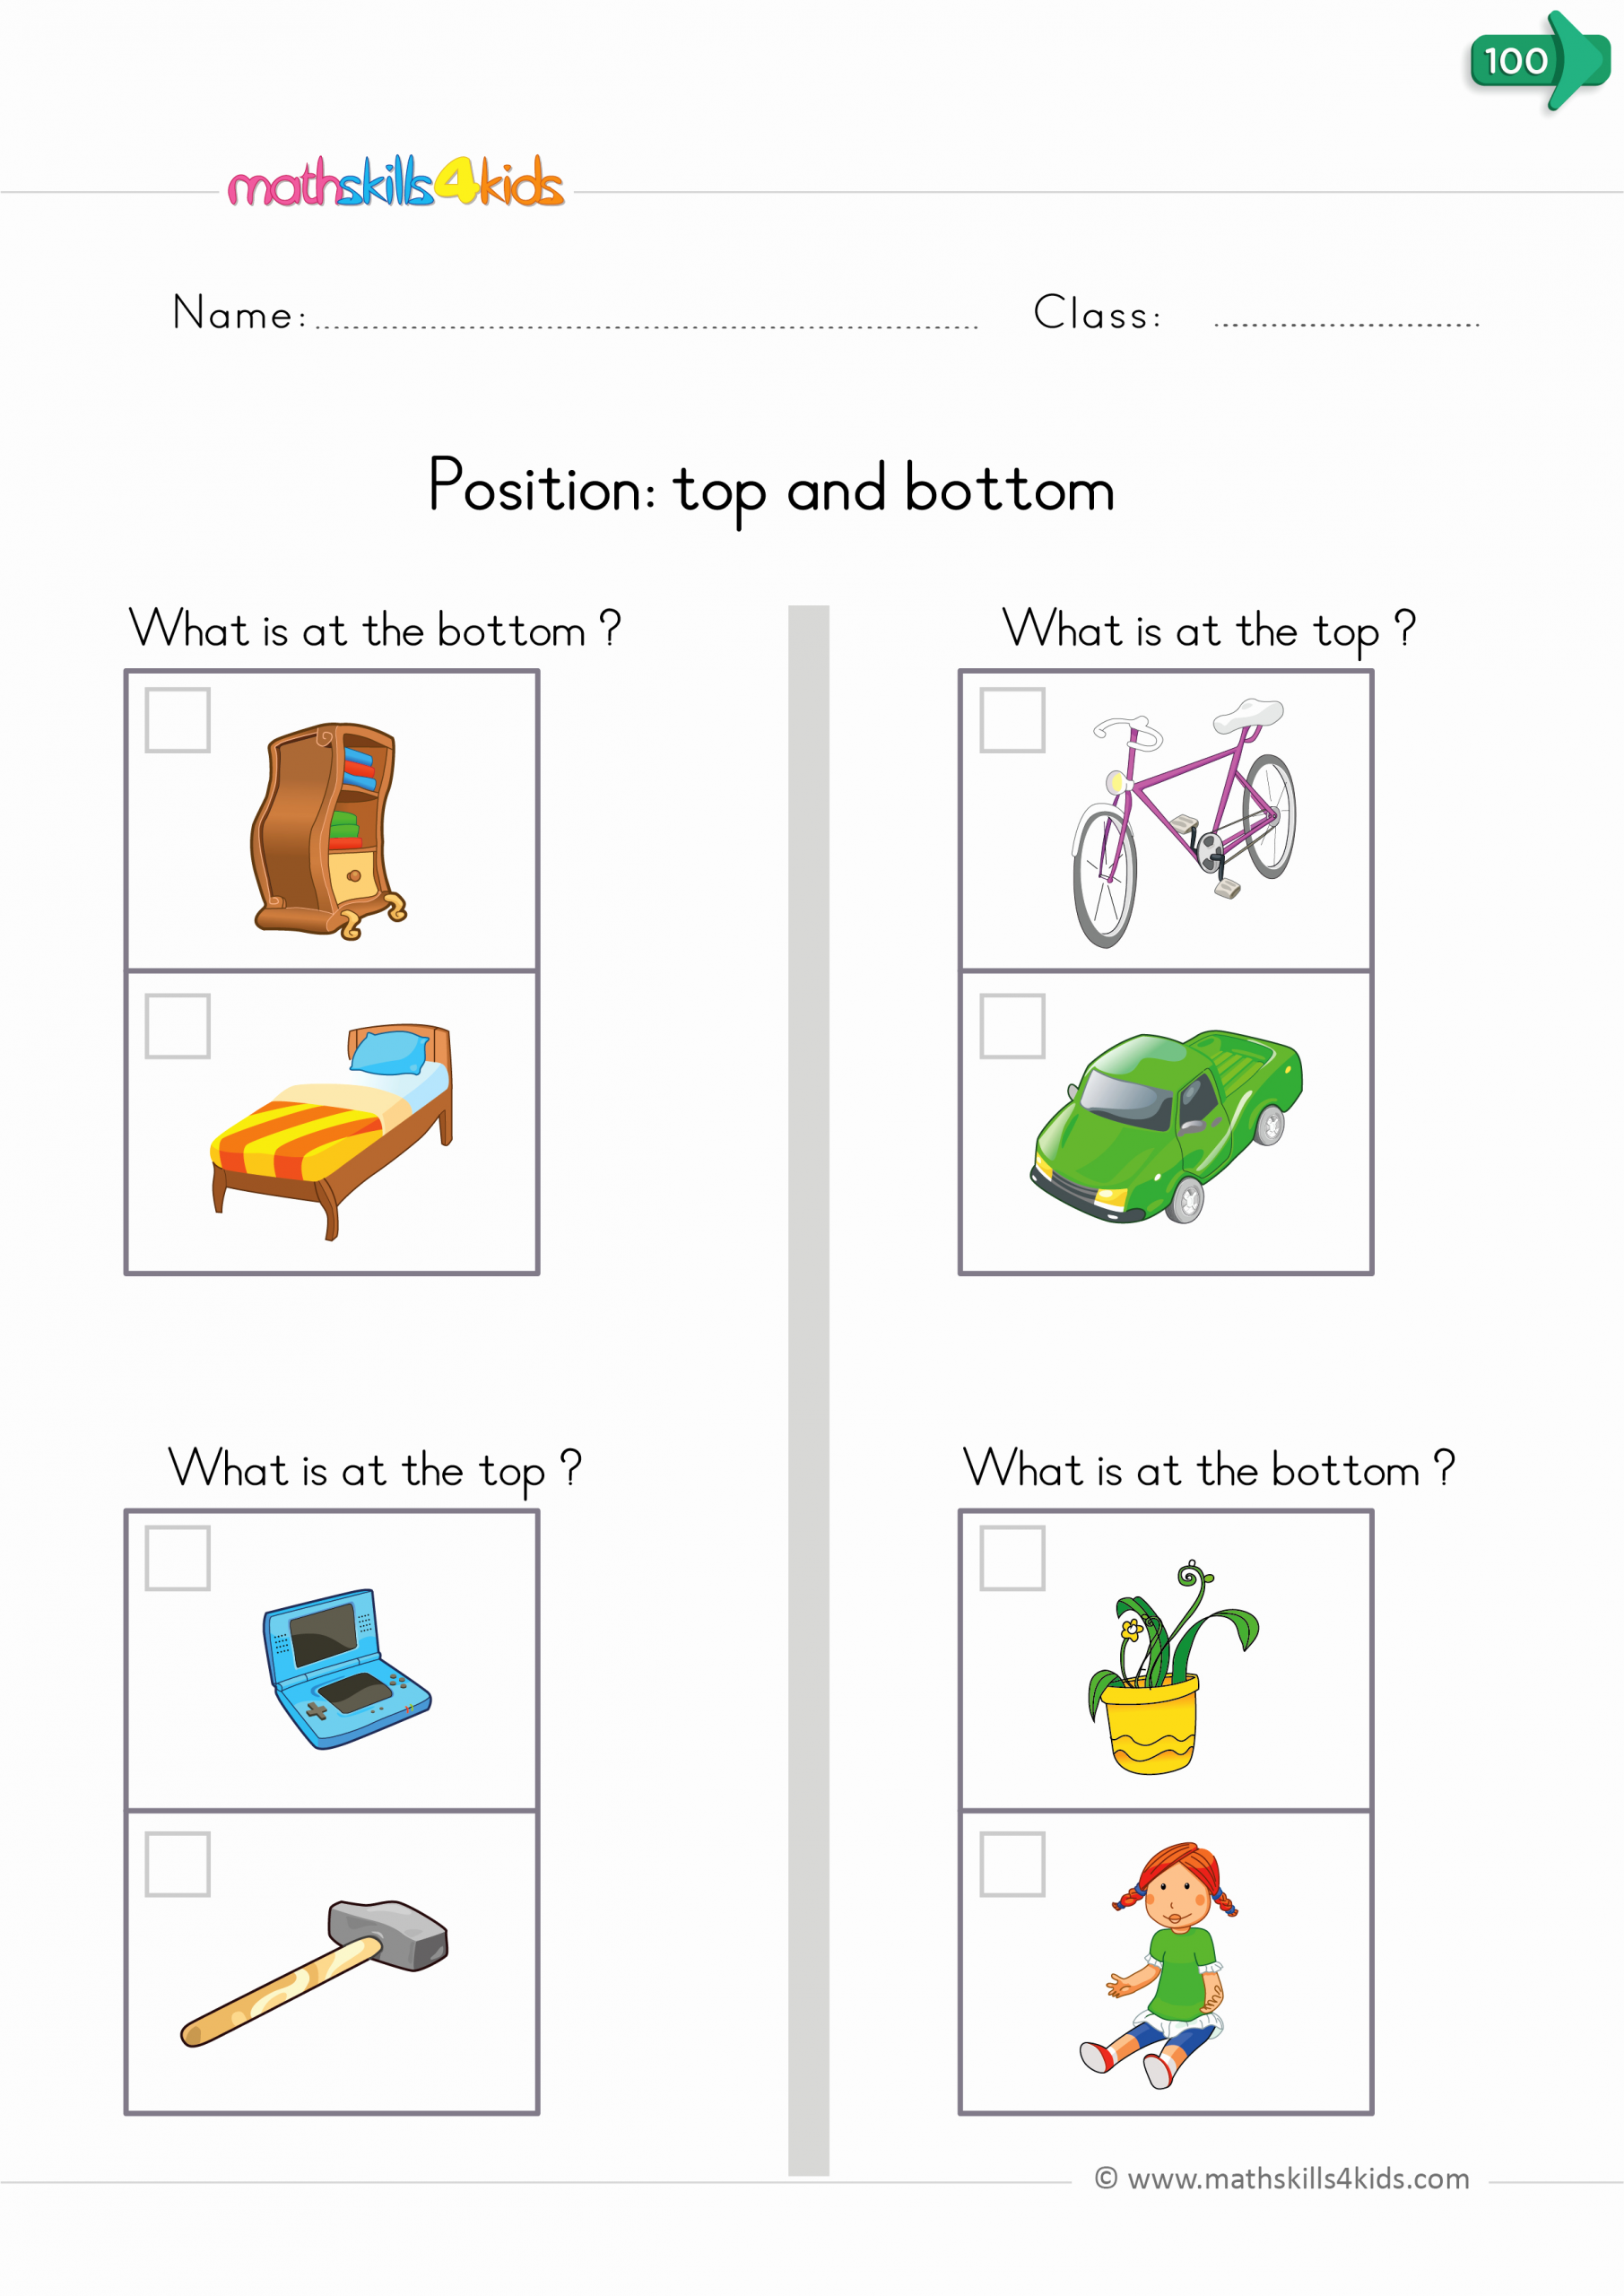 Positional Words Worksheets for Preschool Unique Position Worksheets for Kindergarten